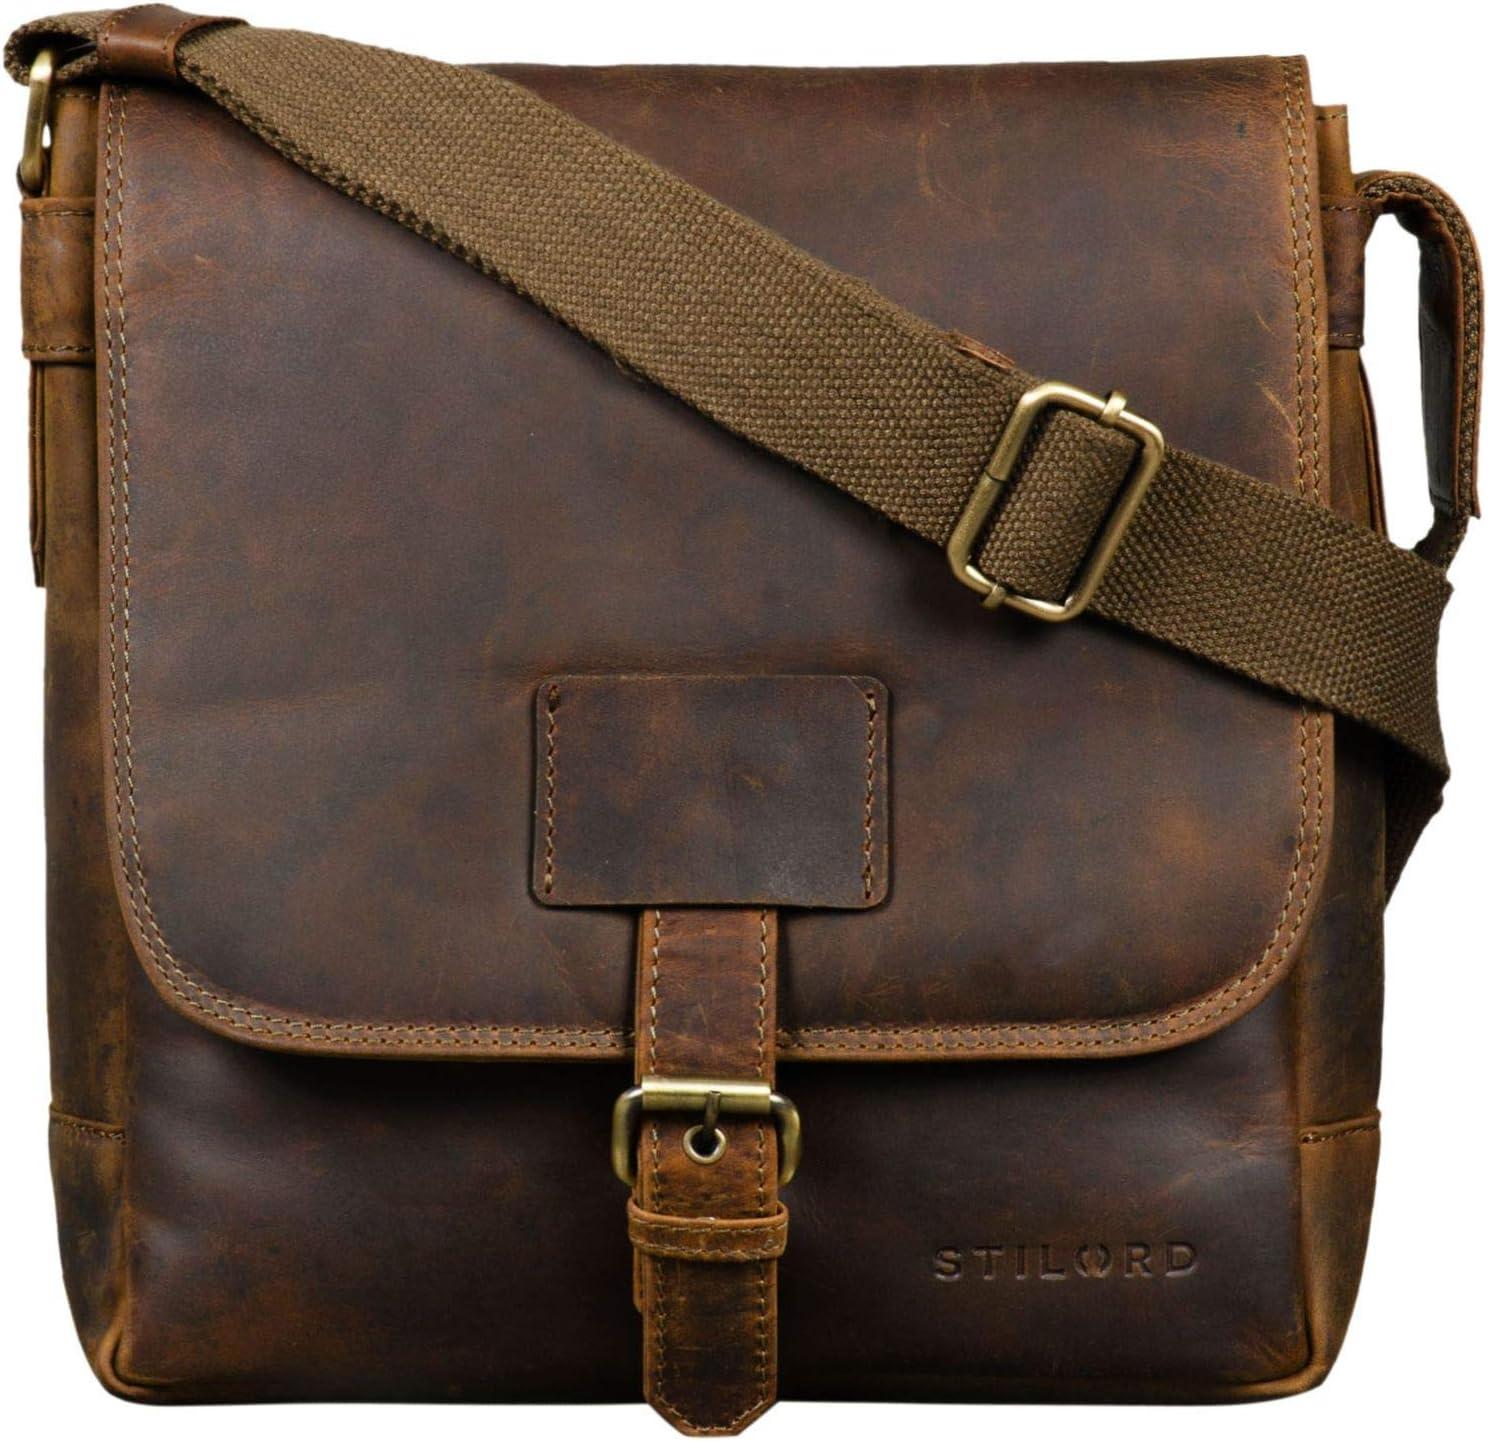 braun STILORD Bennet Messenger Bag Herrentasche Leder zum Umh/ängen Hochwertige Schultertasche f/ür 10.1 Zoll Tablet iPad Echtes Vintage Leder Farbe:dunkel